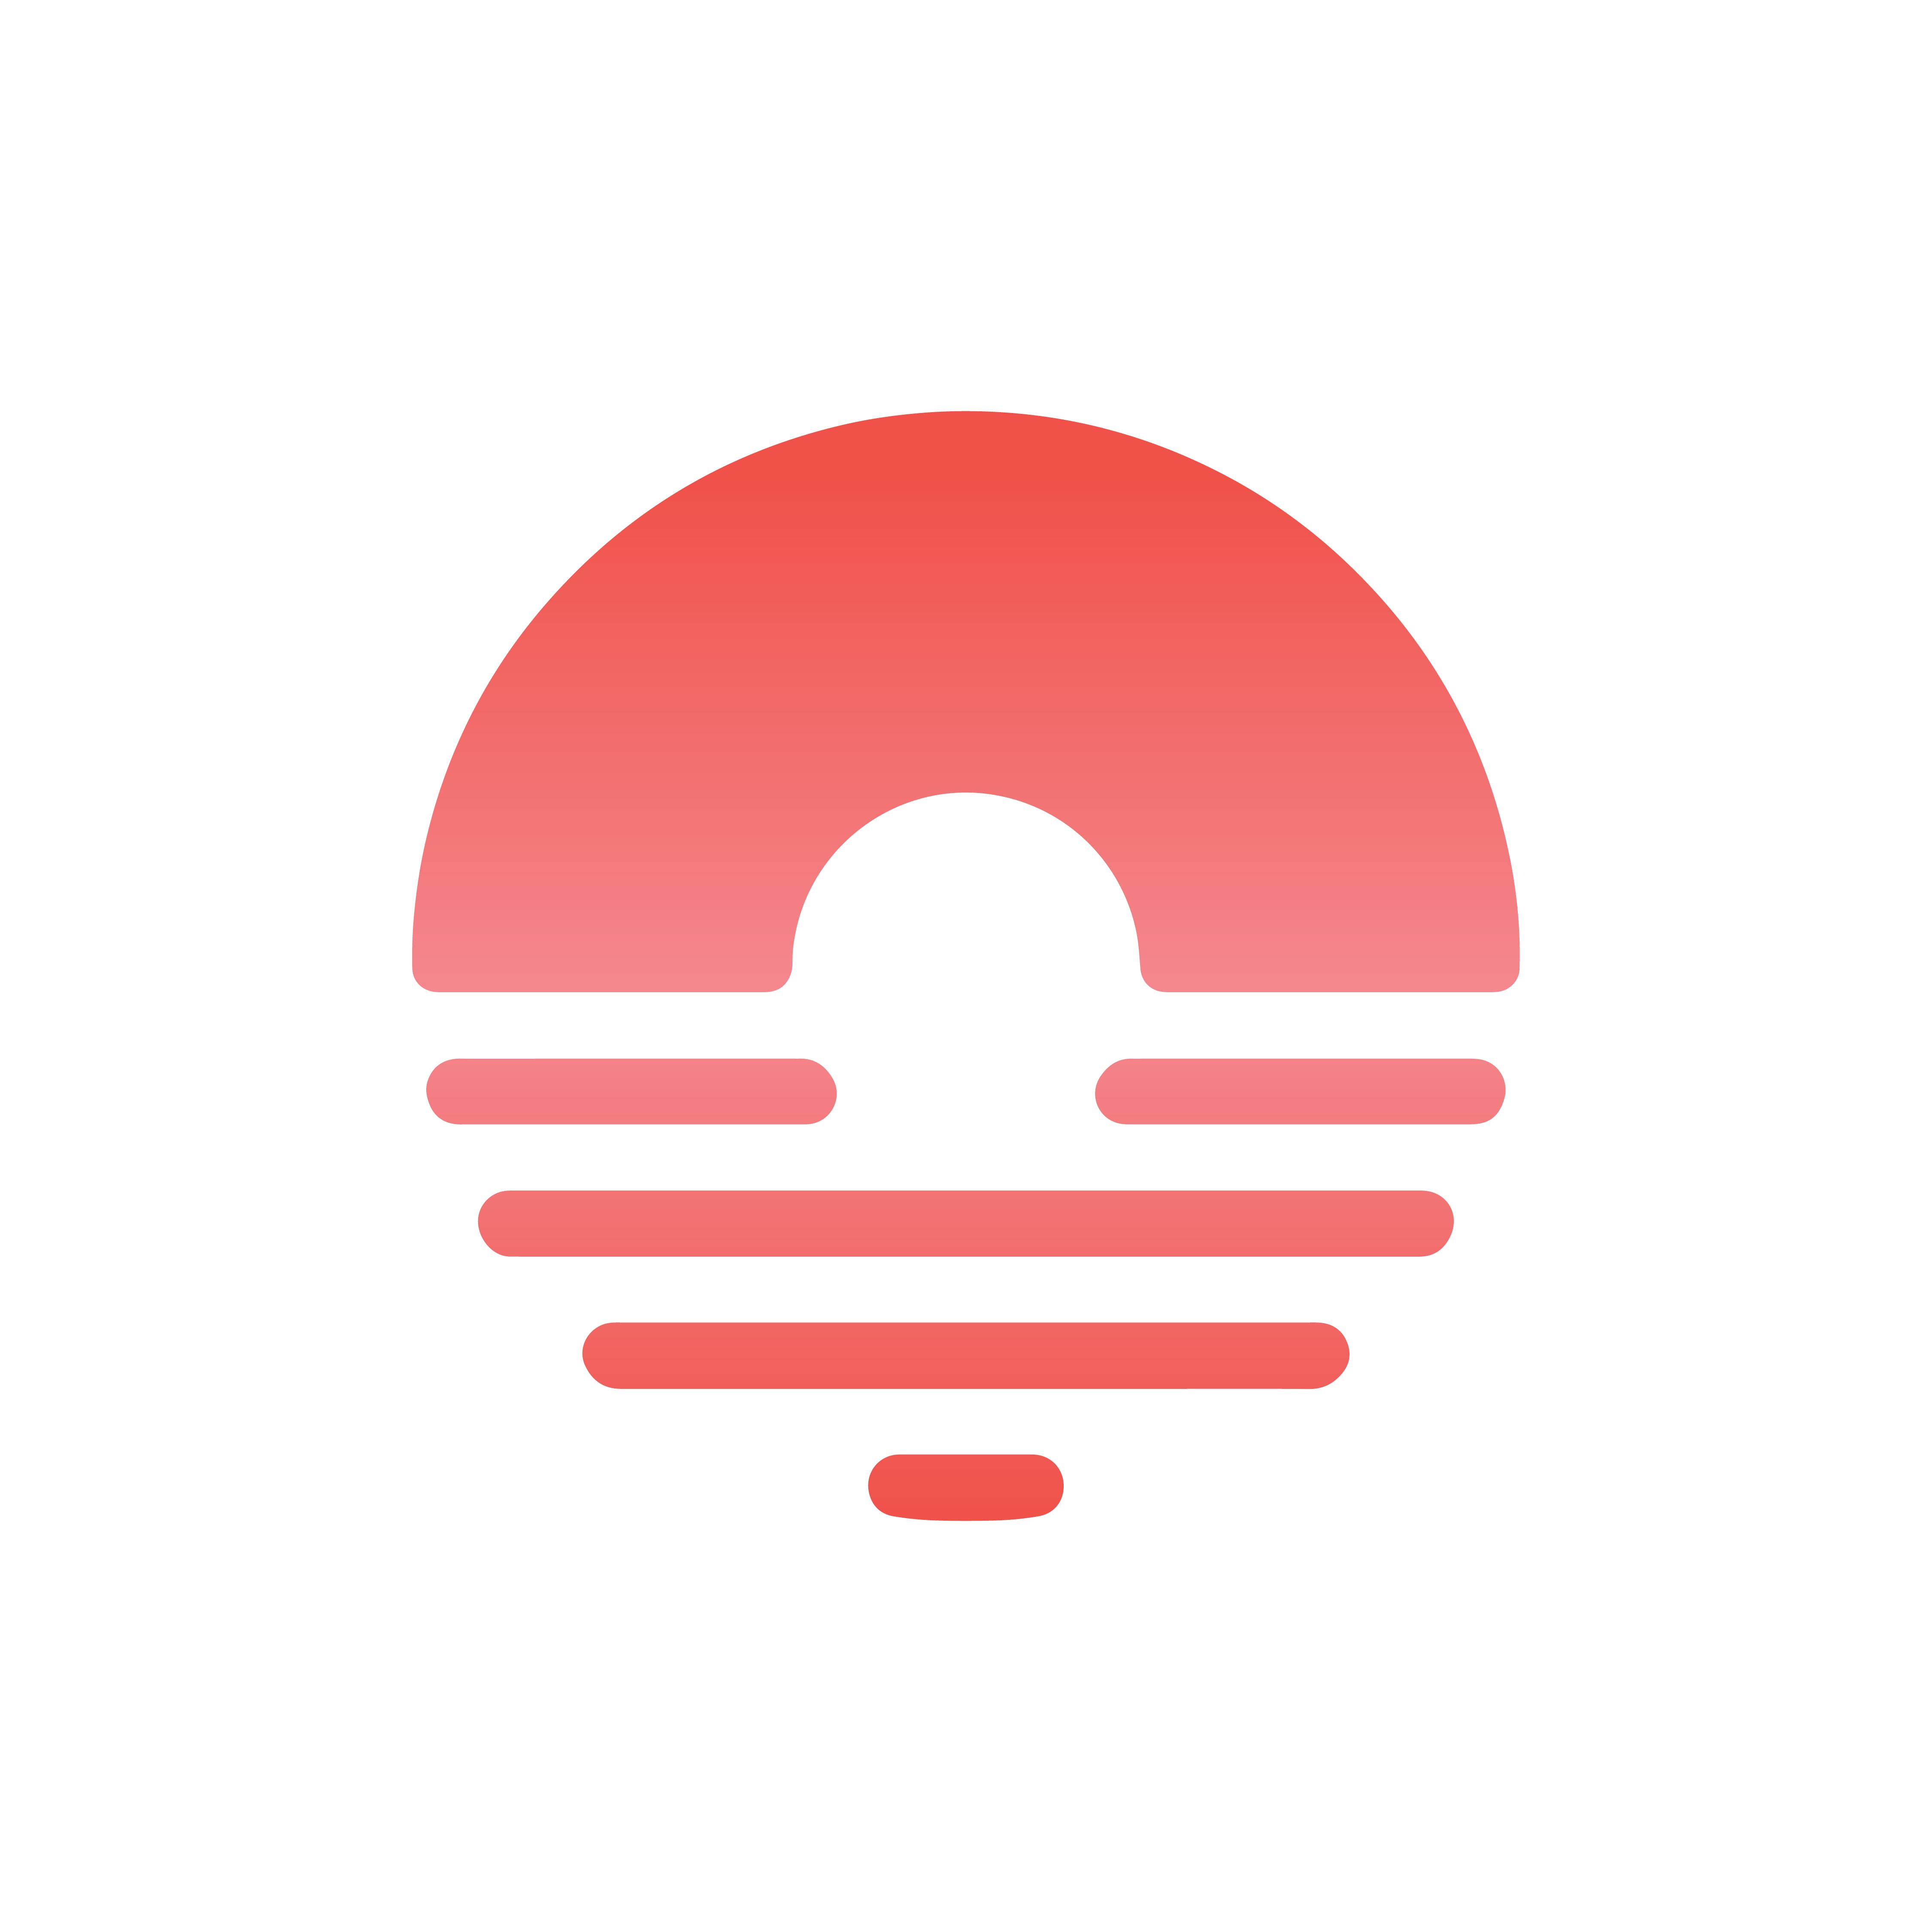 Seaside Doughnuts logo design by logo designer Always Abounding